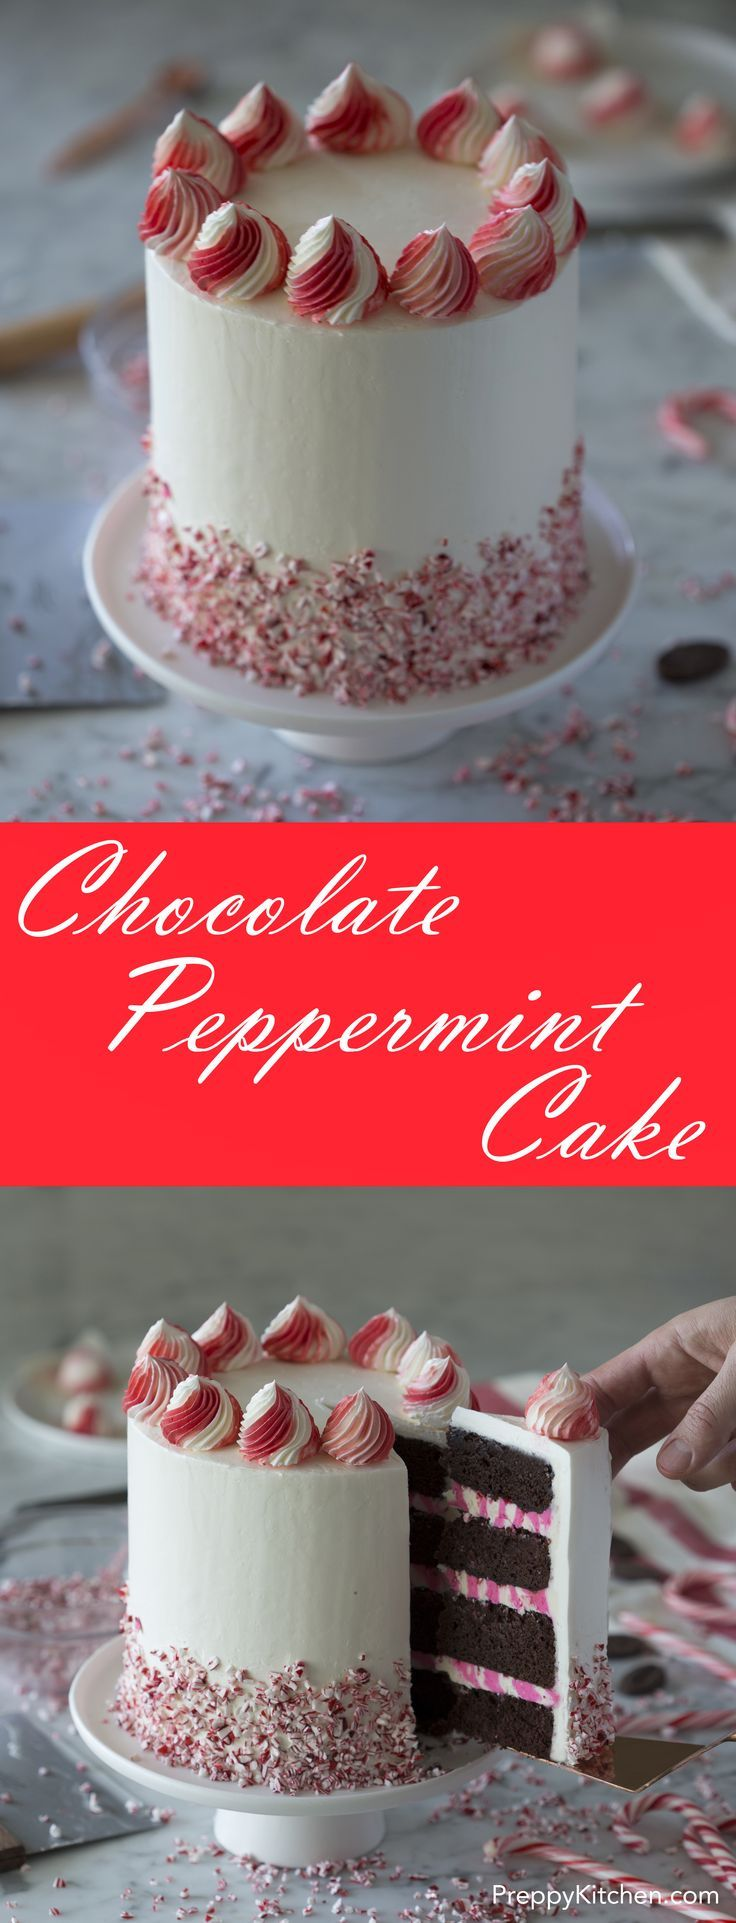 Chocolate Peppermint Cake via @preppykitchen. Christmas Baking. Christmas Cake Ideas.